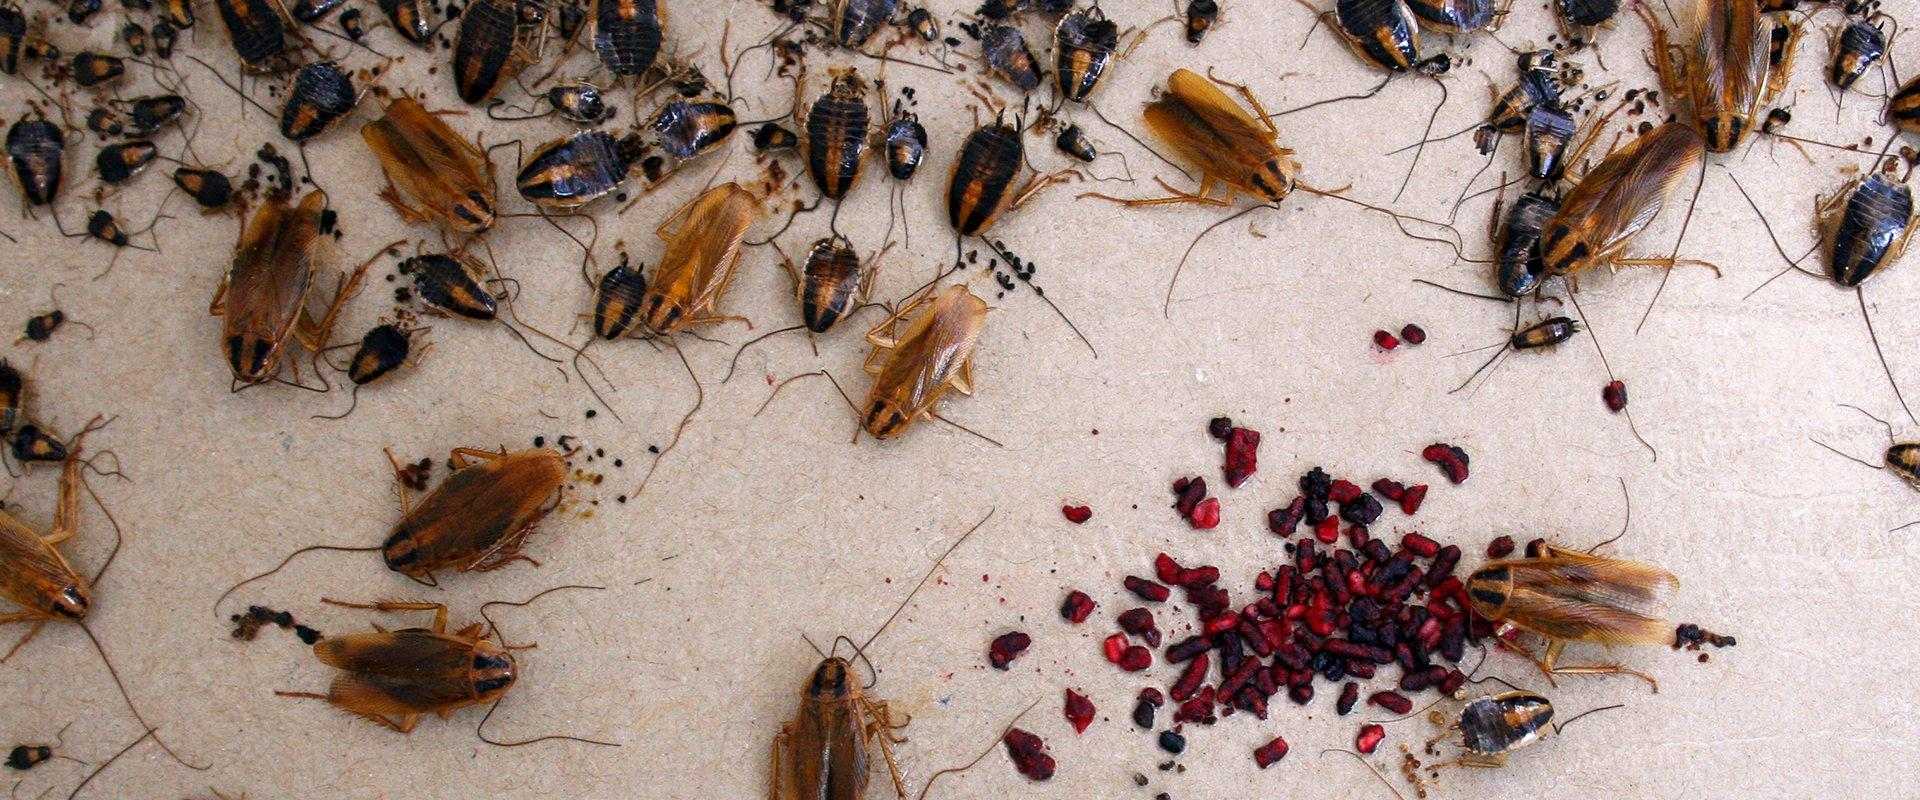 german cockroaches stuck on a glue board